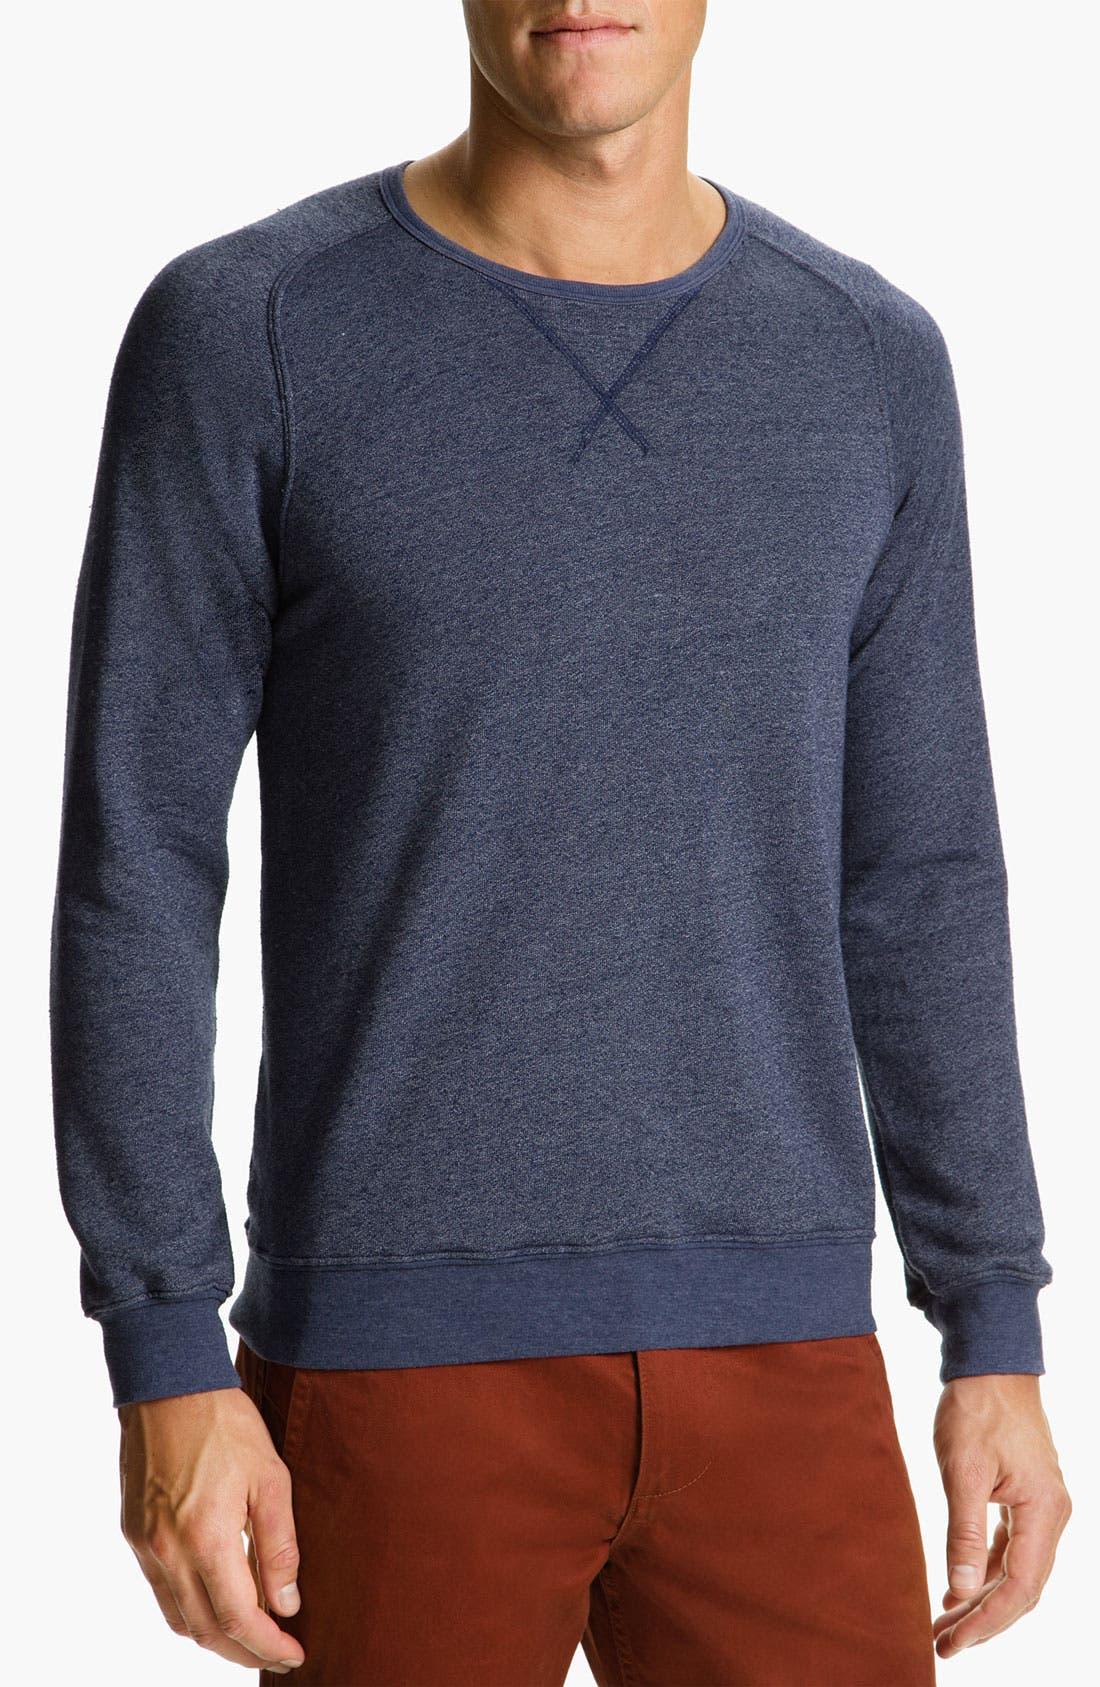 Alternate Image 1 Selected - Riviera Club 'Mira Mar' Crewneck Sweatshirt